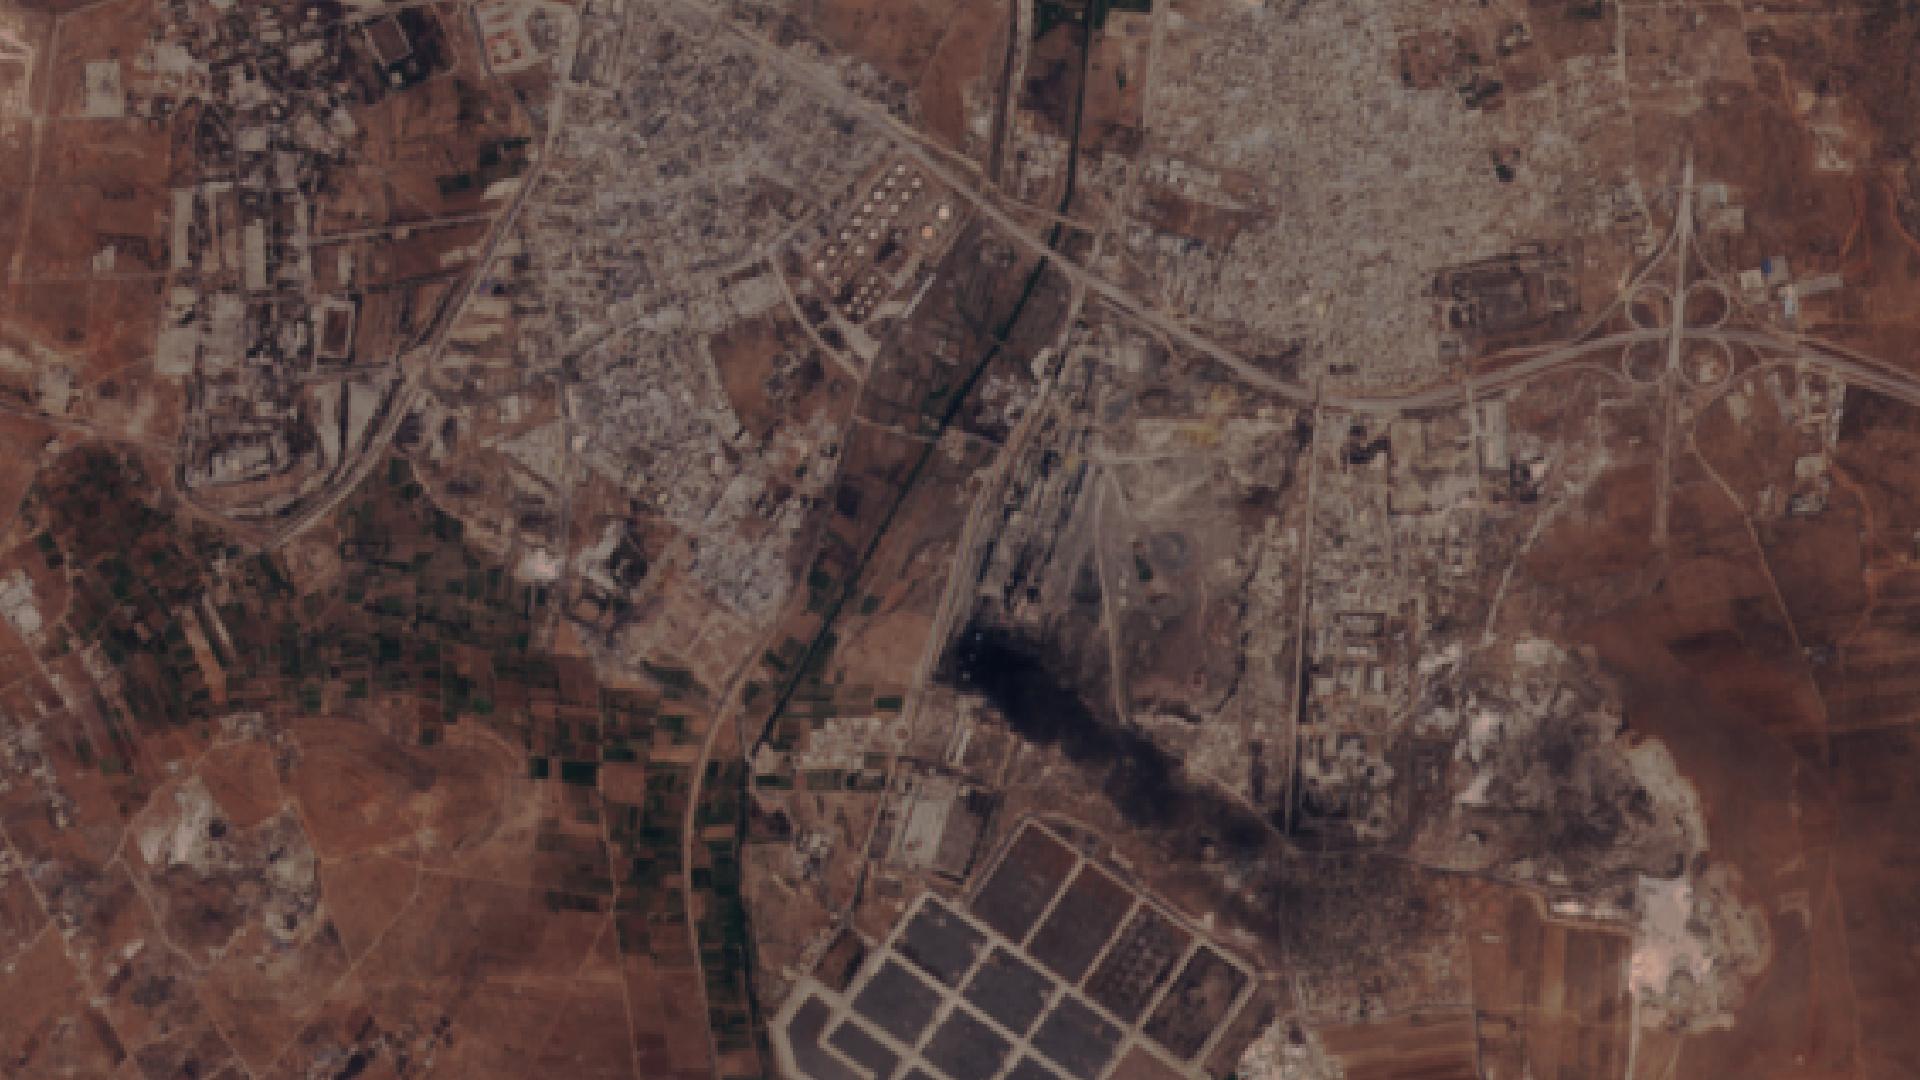 Syrie - Alep - Aleppo - Siège Bombardements - Raid aérien - rebelle - Omran - Sentinel-2 - ESA - 14 août 2016 - satellite - Copernicus - Union européenne